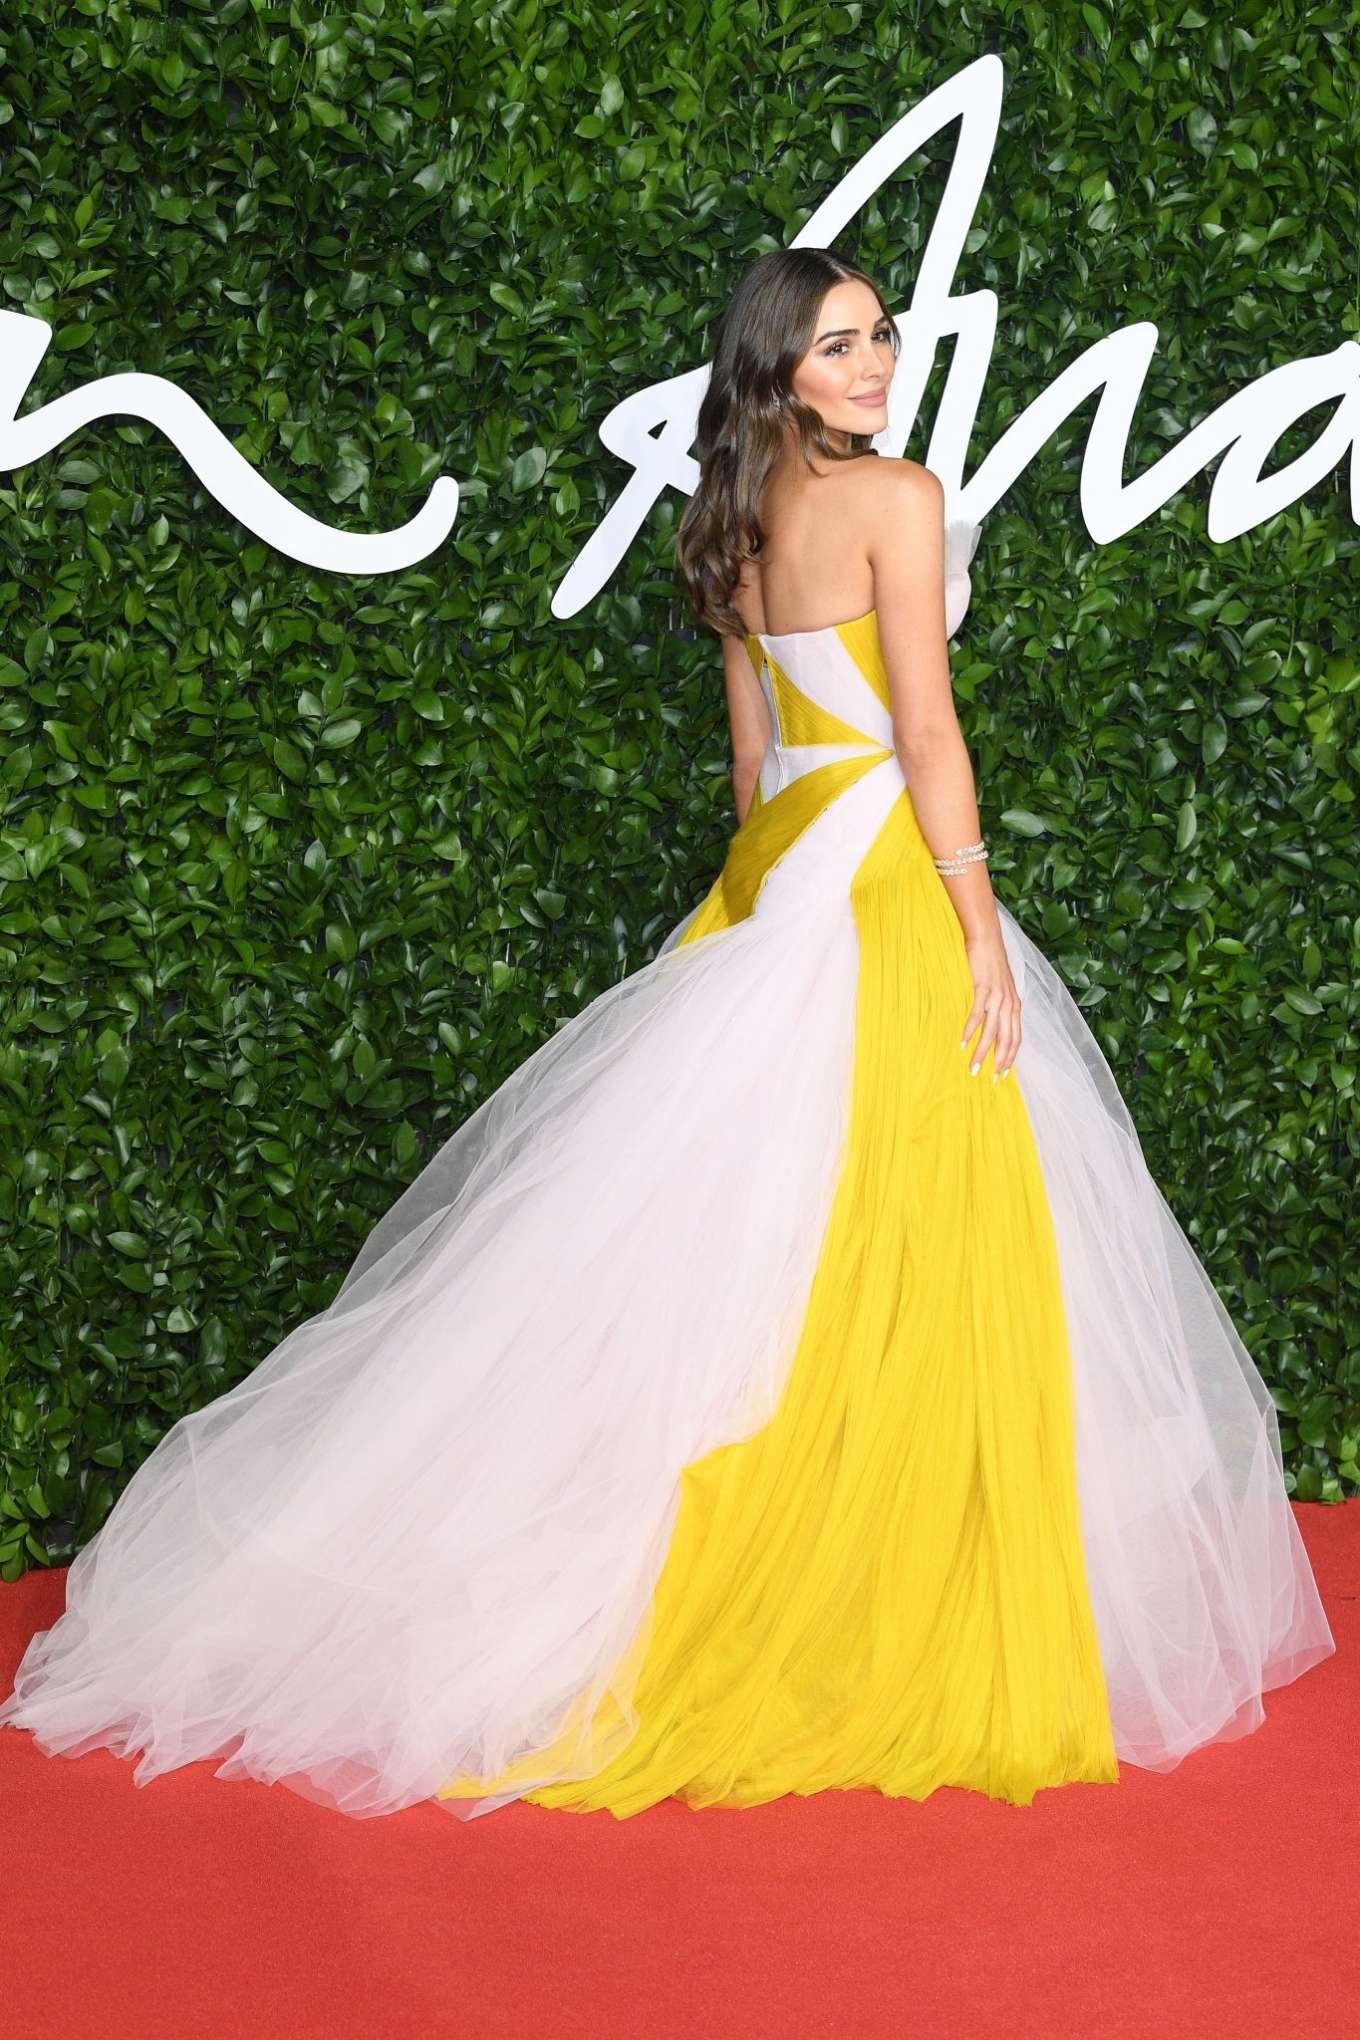 Olivia Culpo 2019 : Olivia Culpo – Fashion Awards 2019 in London-03